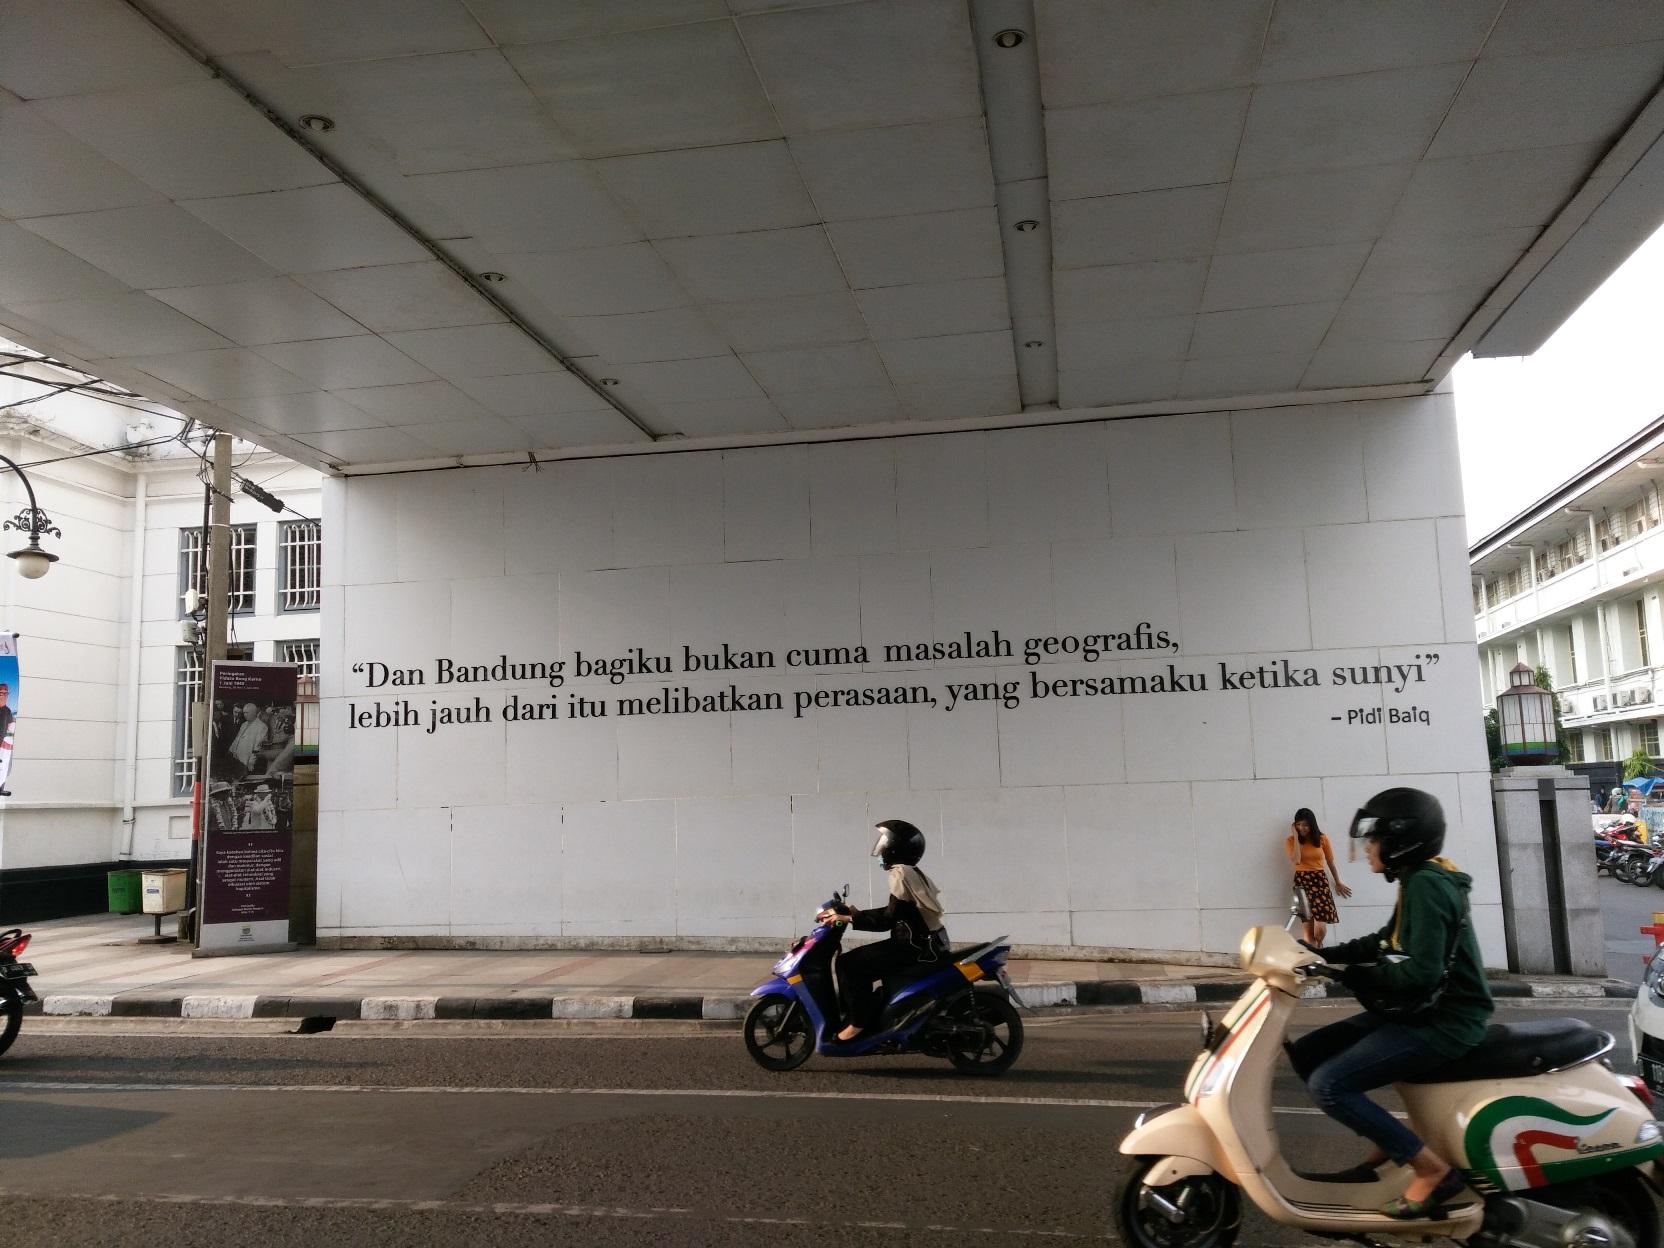 Bandung Jalan Asia Afrika Alun Masjid Raya Braga Melewati Gapura